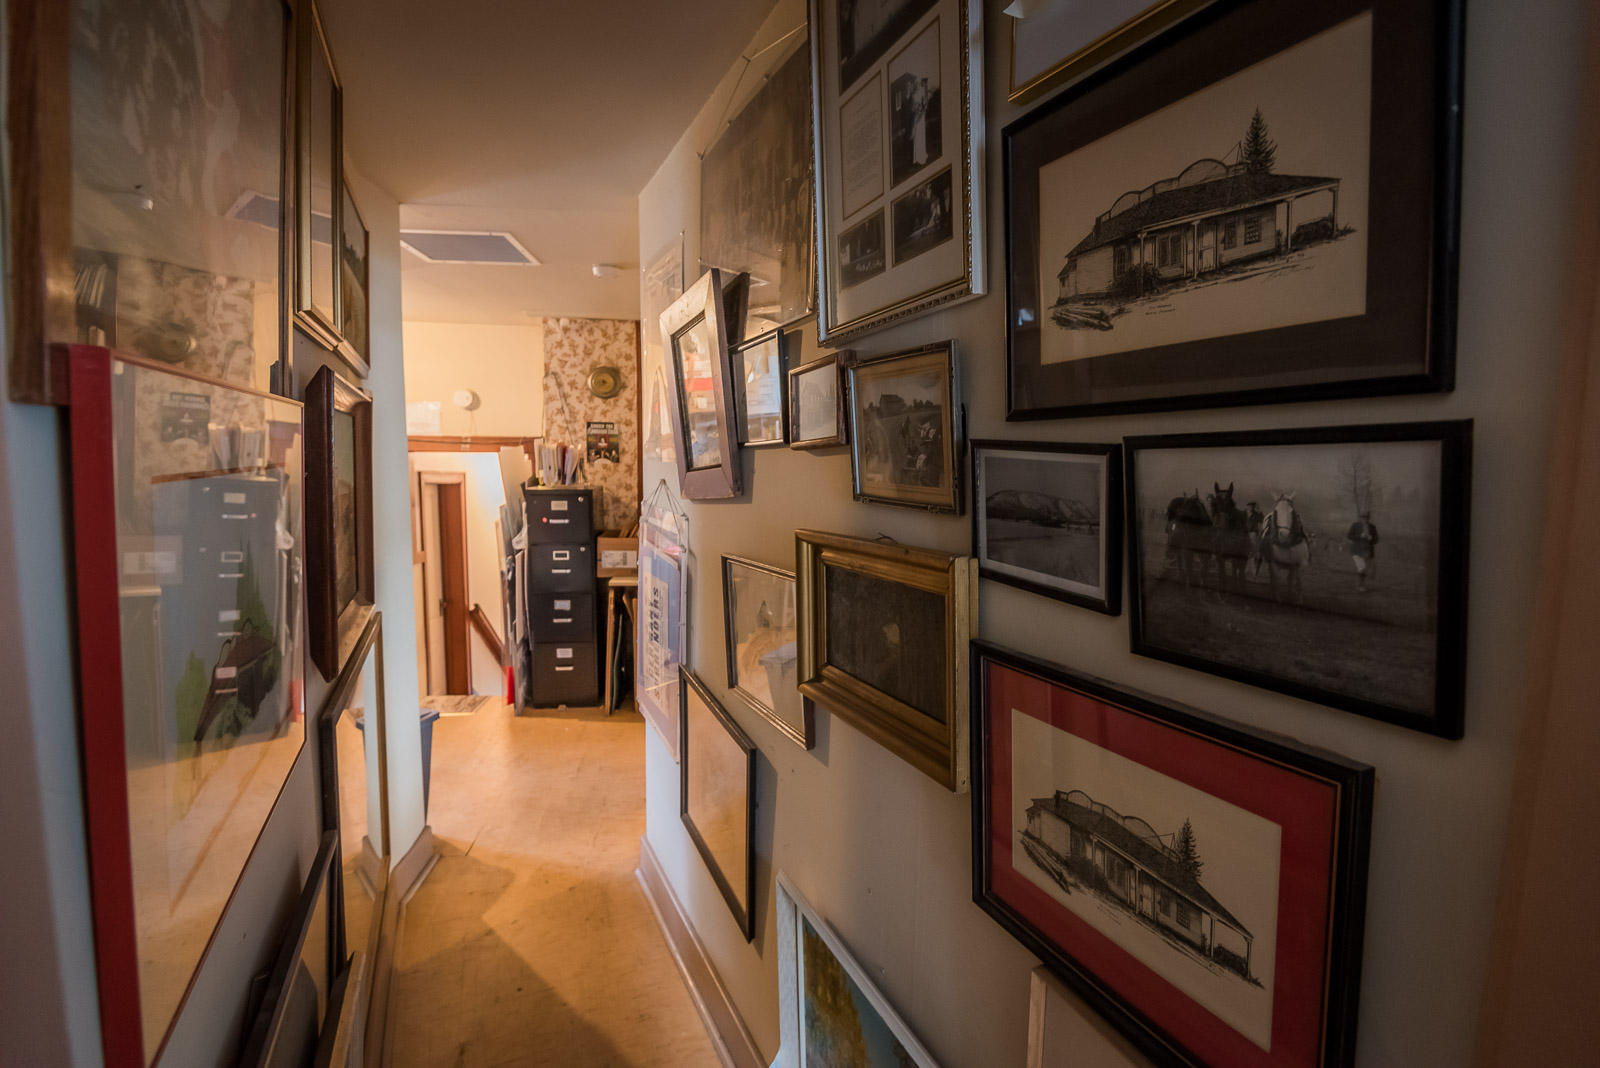 Pitt Meadows Museum archives